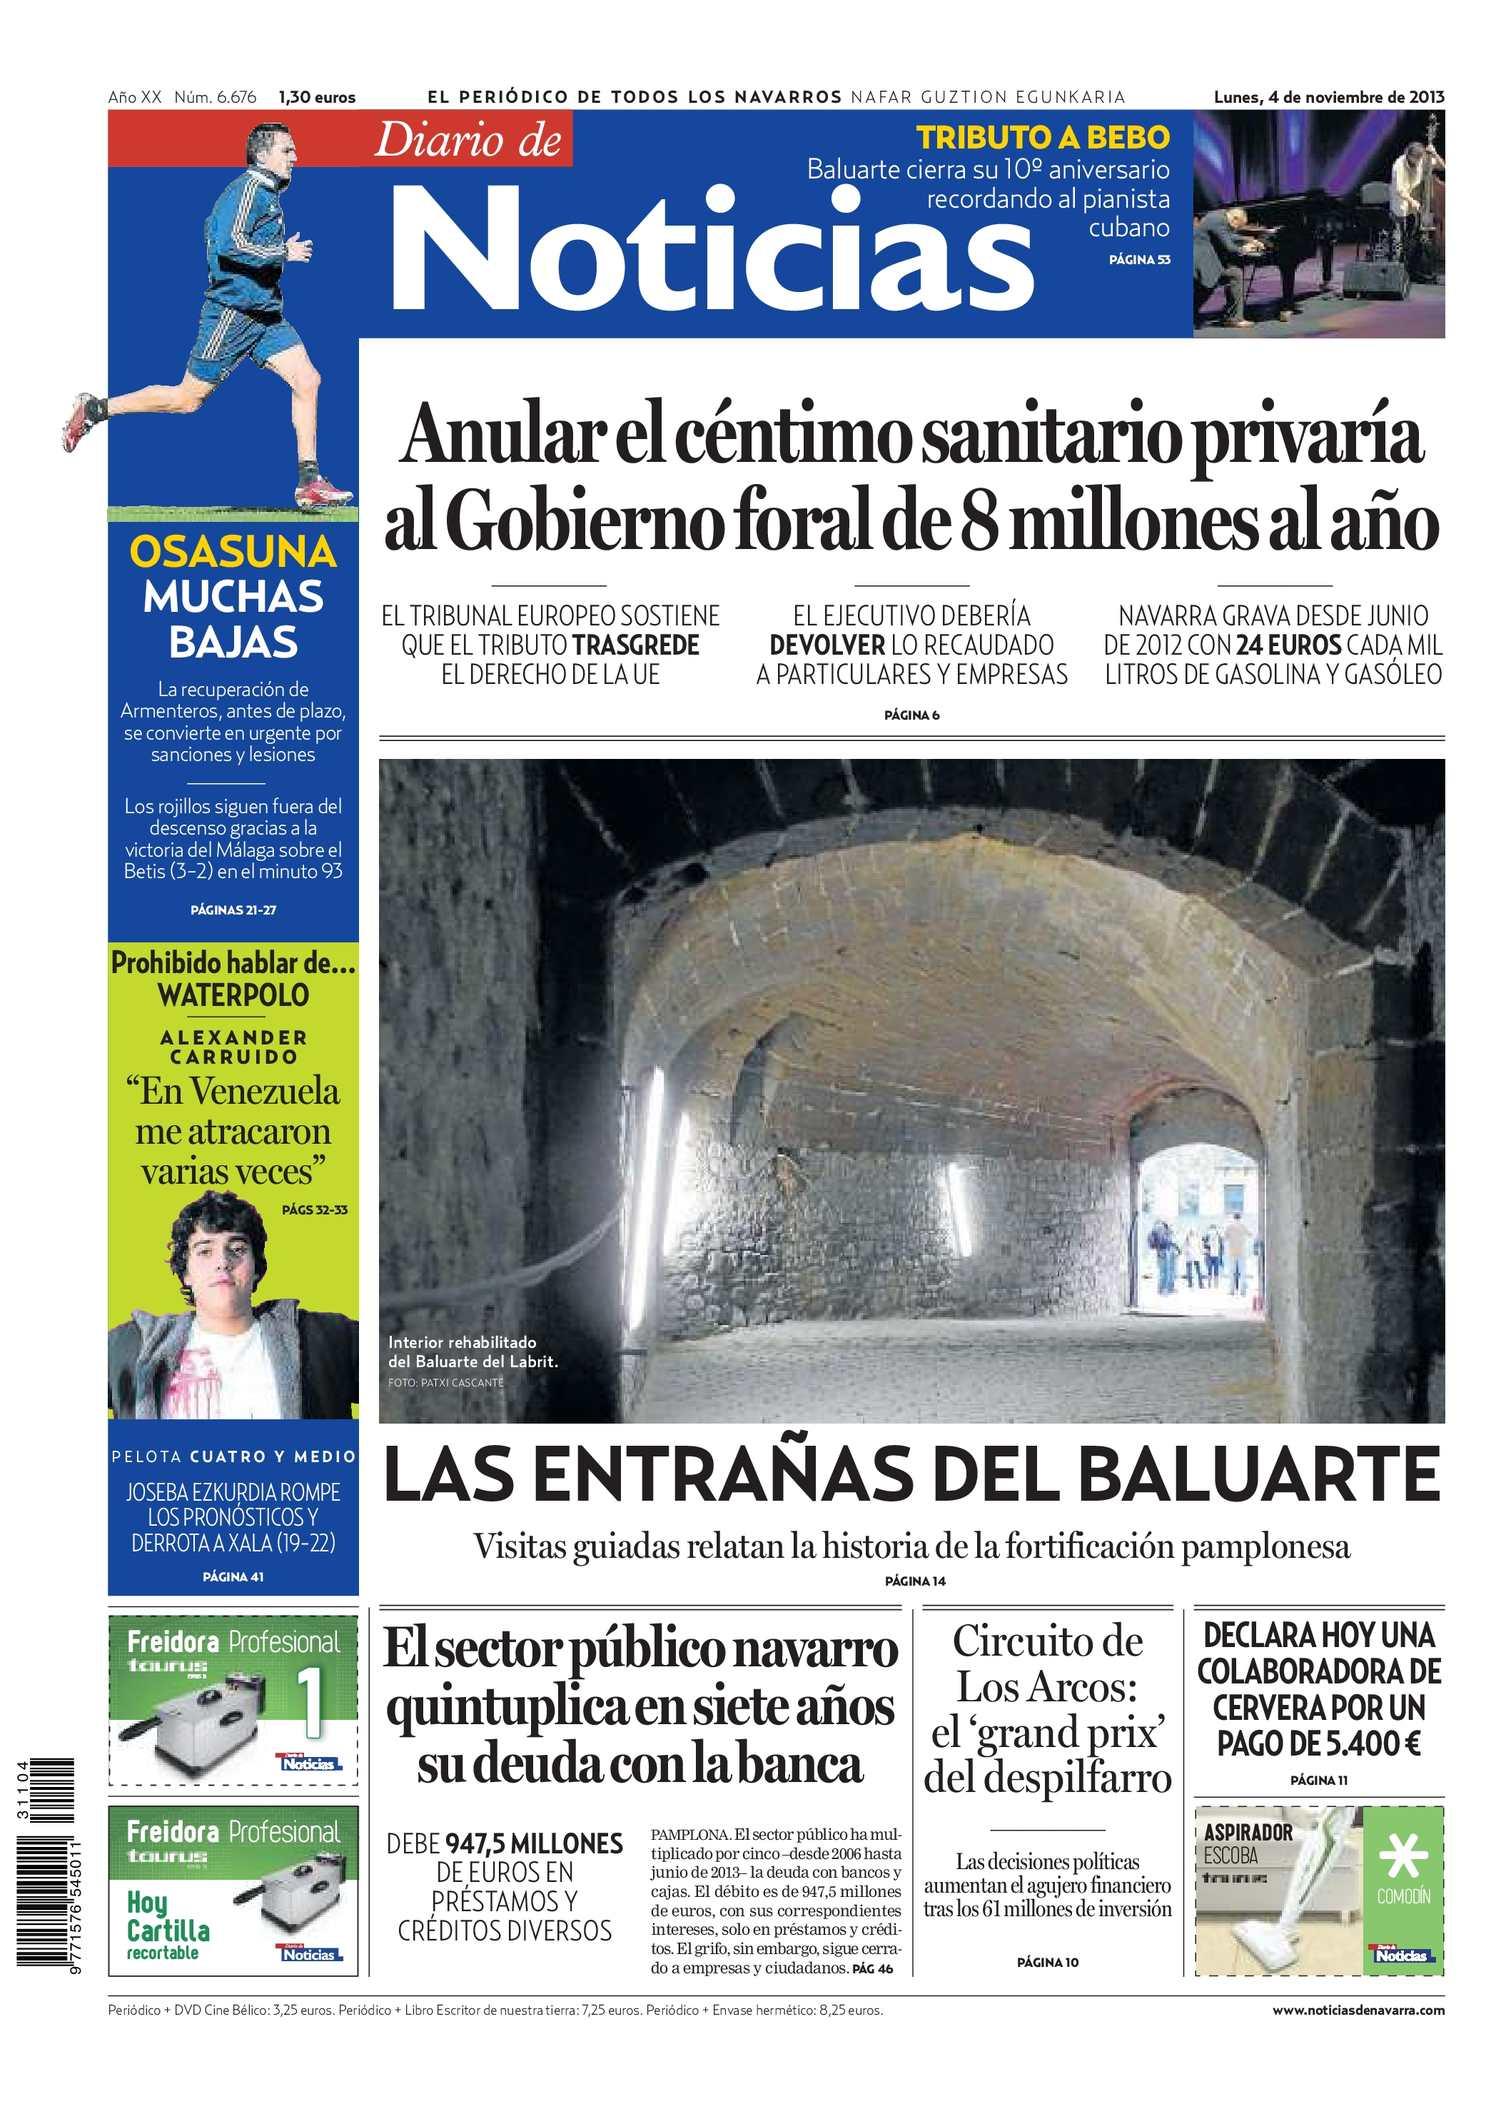 Calaméo - Diario de Noticias 20131104 65d7942aedf2